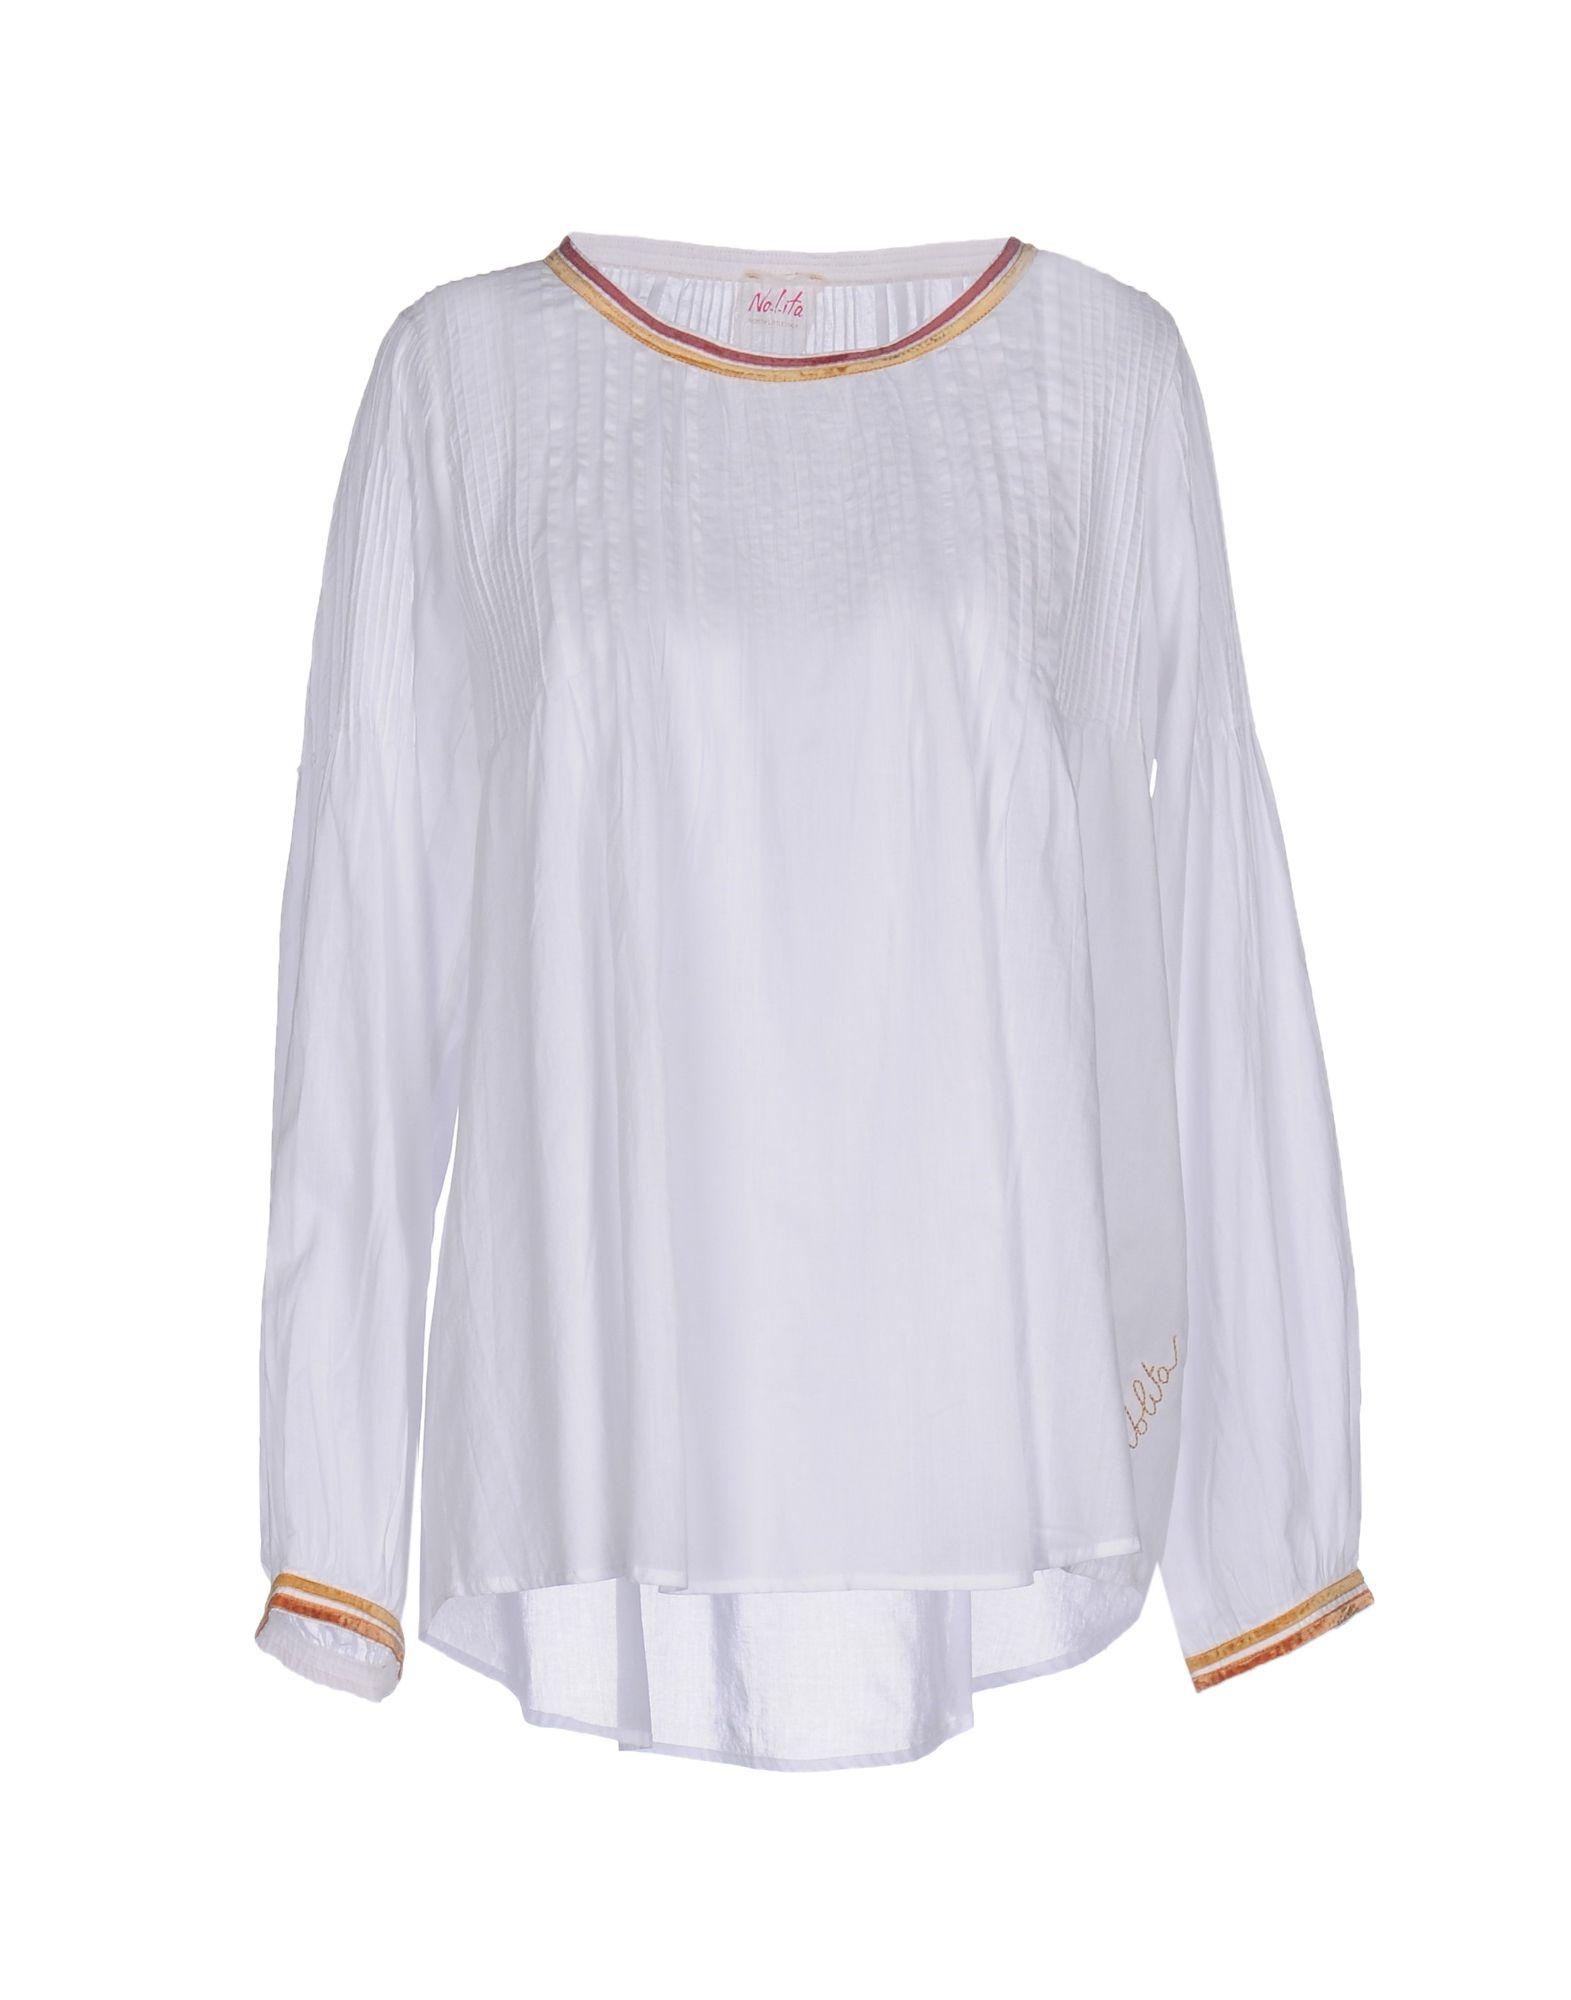 ФОТО nolita блузка